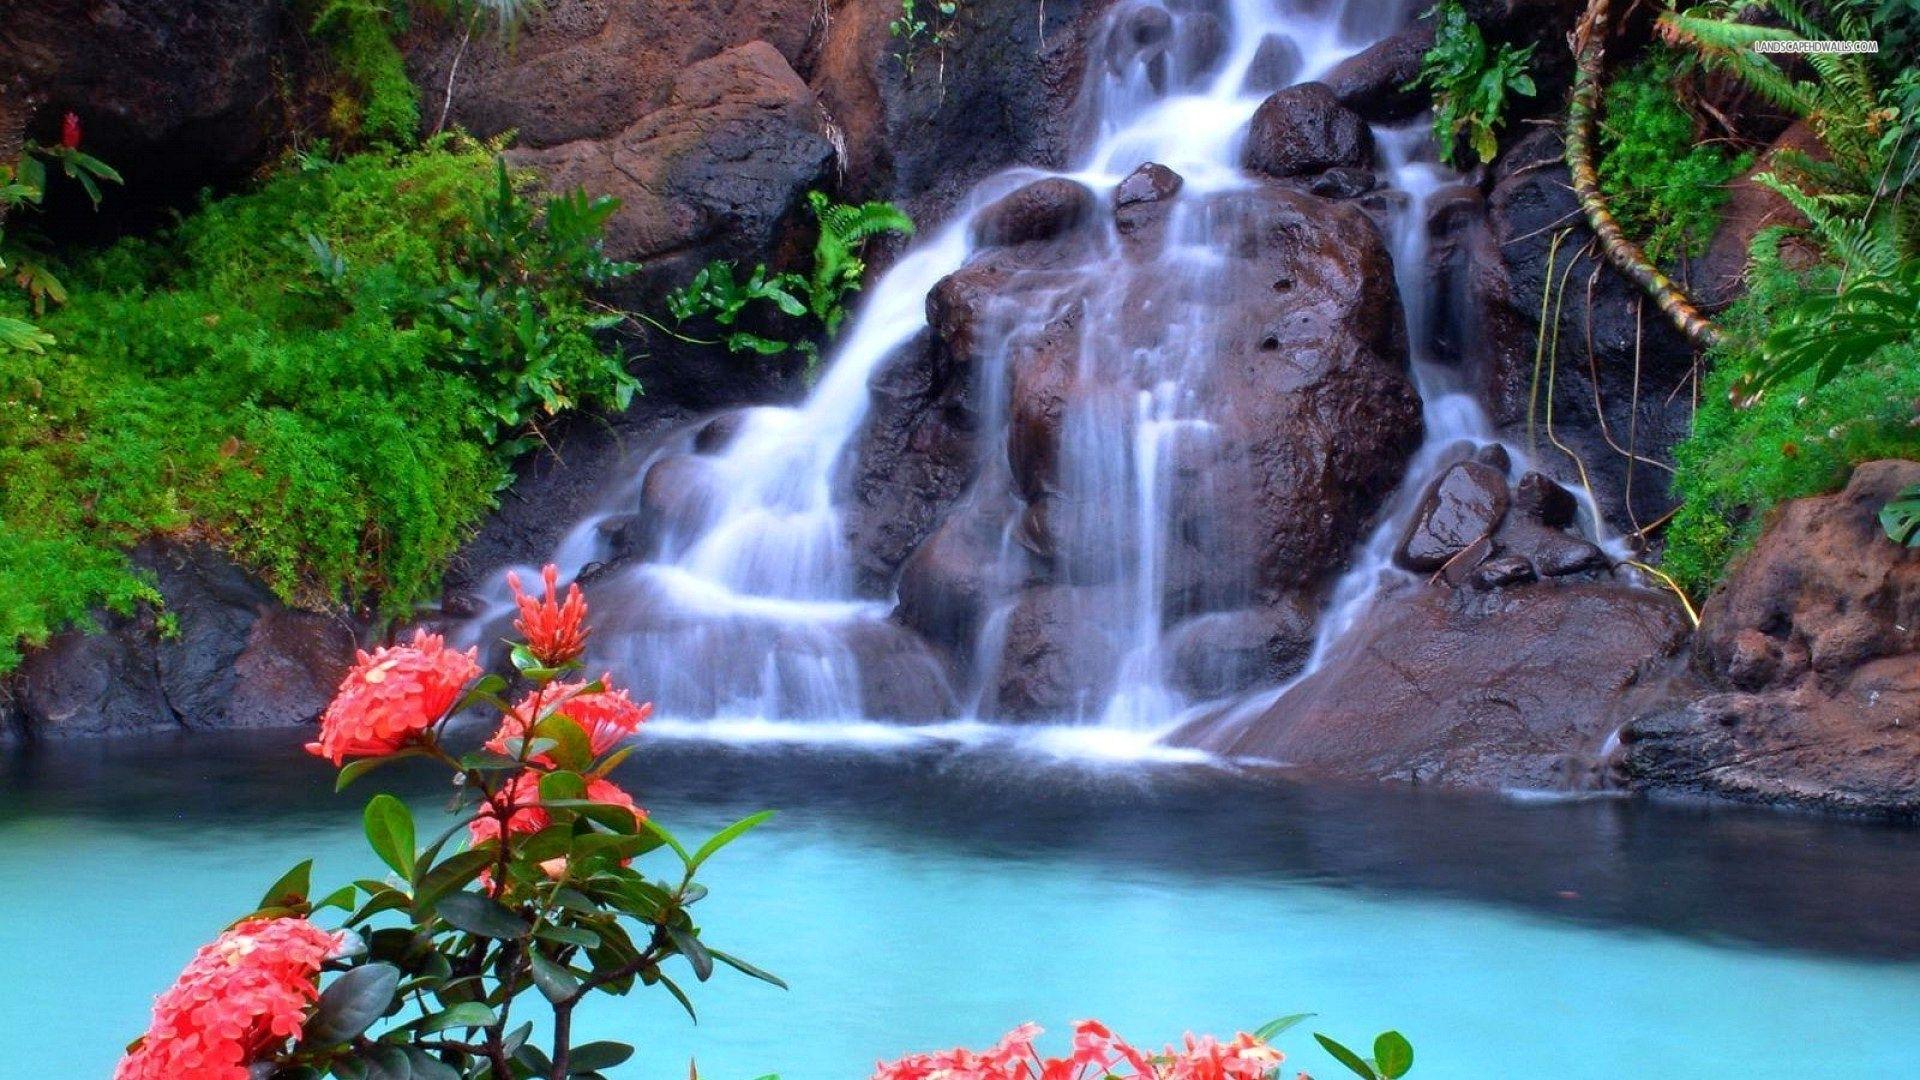 beautiful-waterfall-and-pink-flowers-free-hd-for-desktop - hd wallpaper